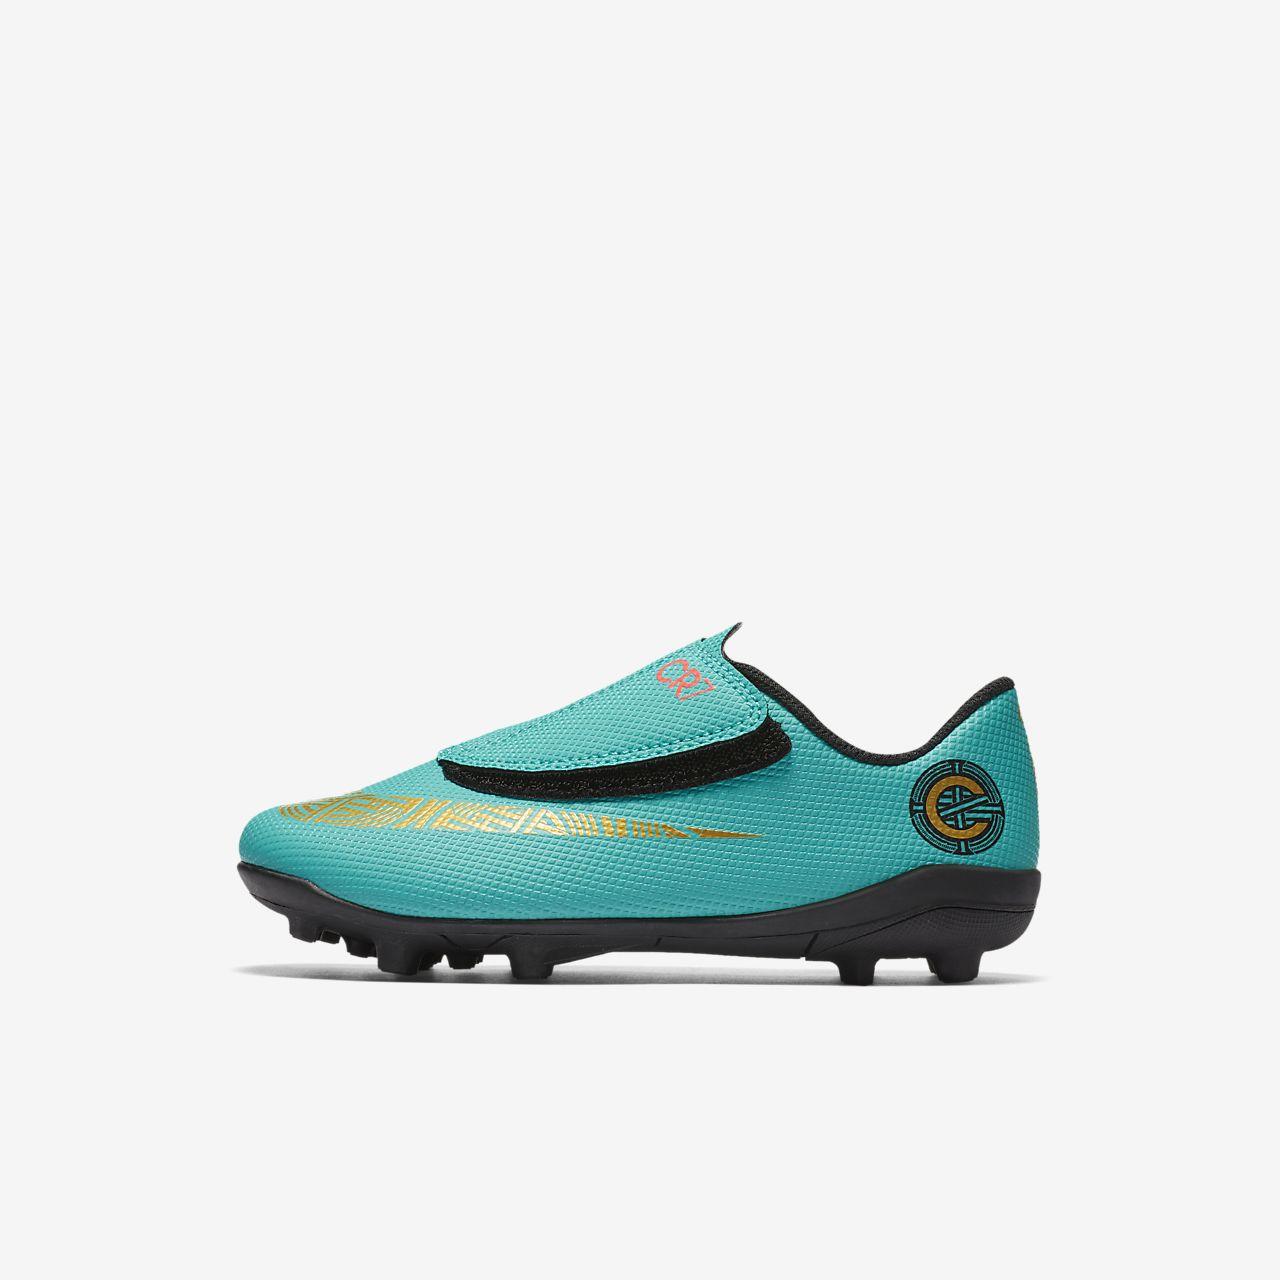 Mg Para Vapor Pfrzwrp8q Jr Botas Fútbol Nike Club Mercurial De Cr7 Xii 4L3S5RAcjq